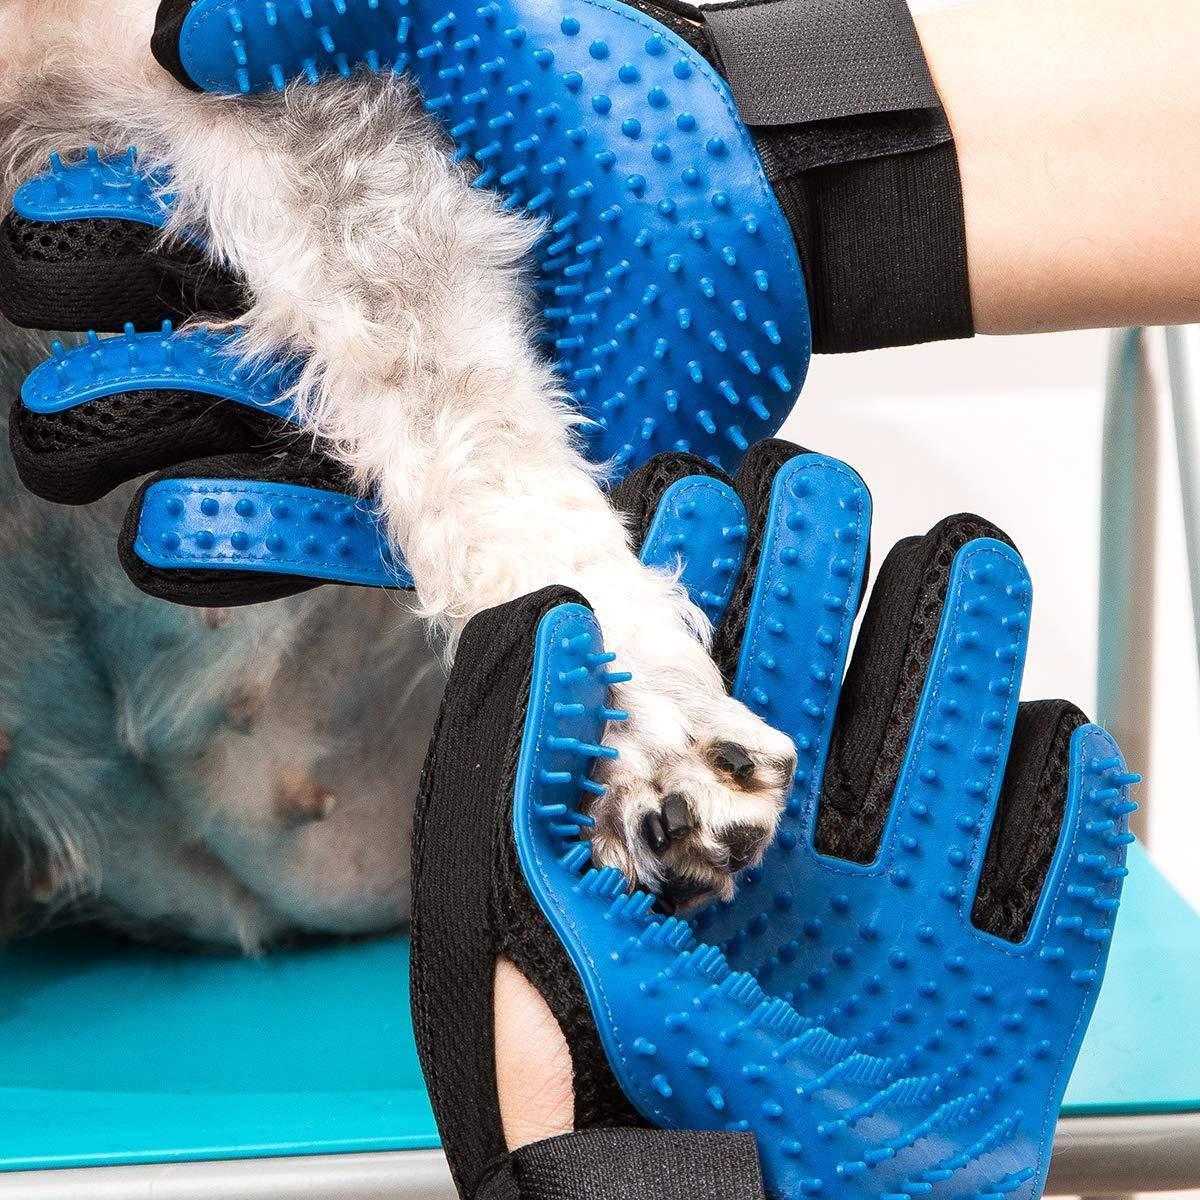 DropSharks Pet Grooming Glove Hair Remover Gentle Bathing Massage